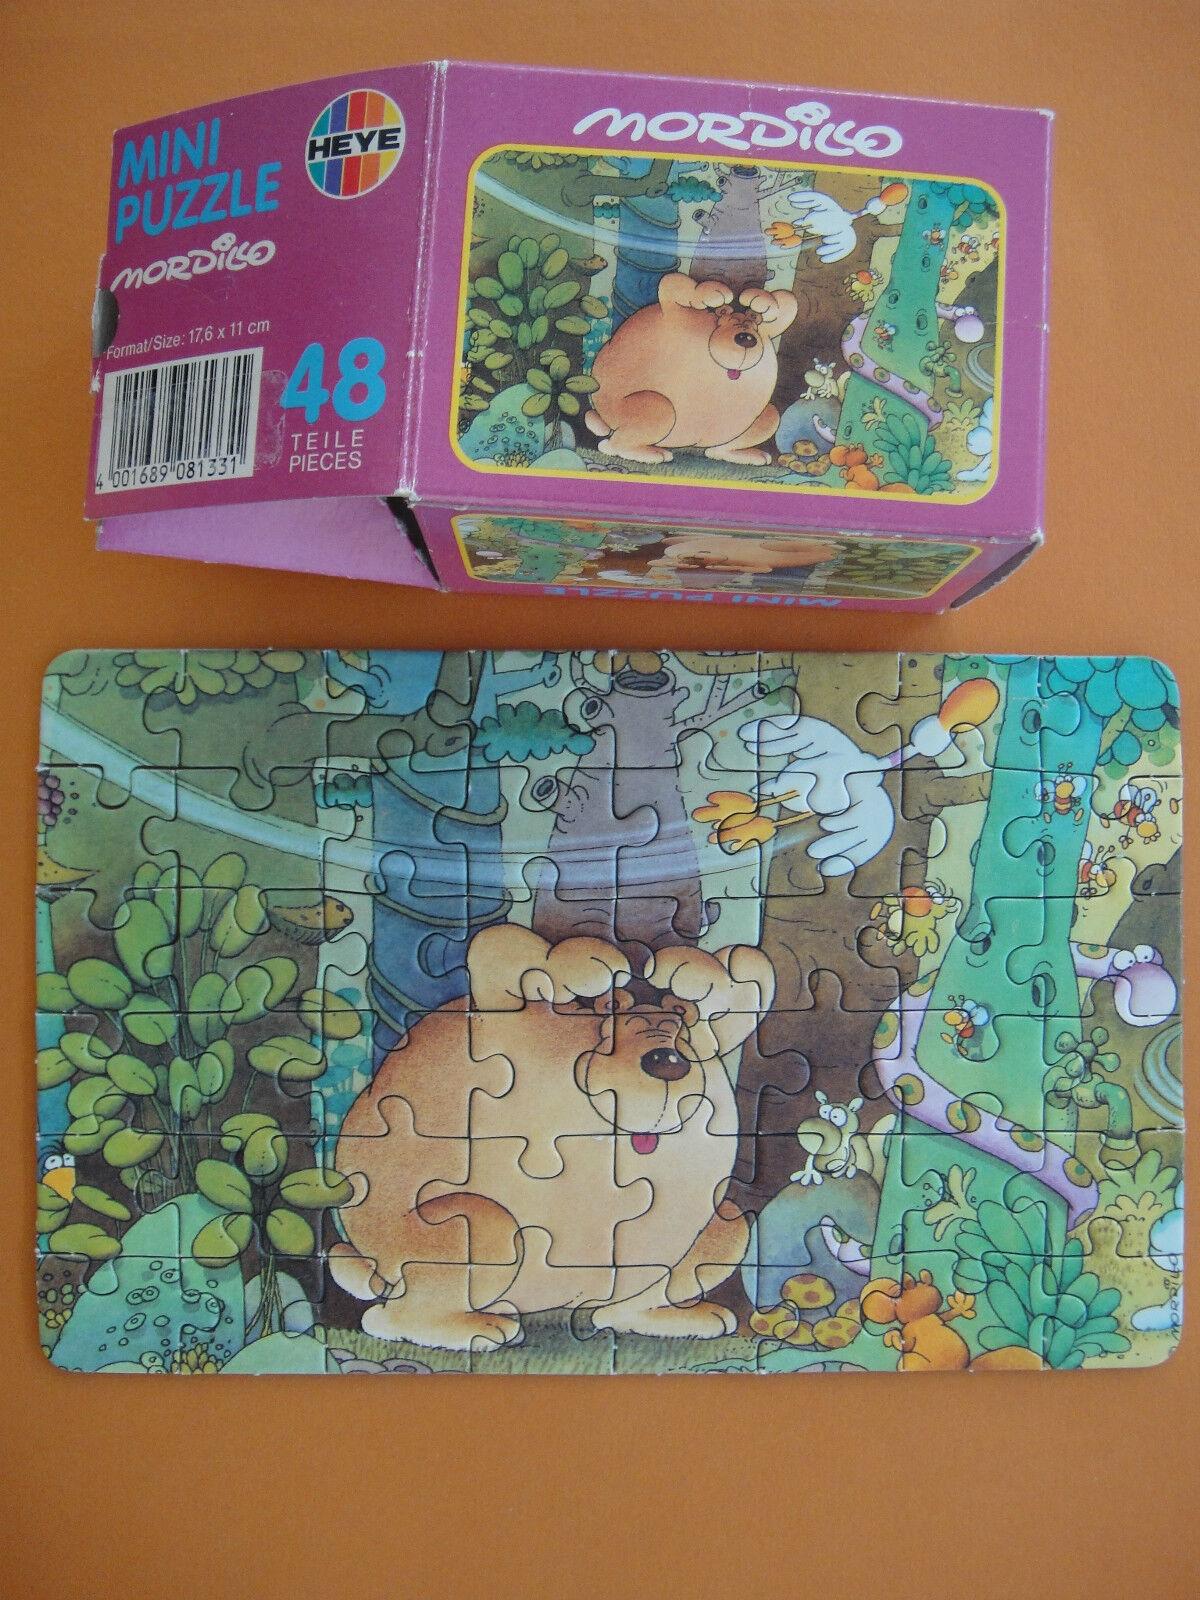 HEYE Puzzle   Jigsaw   Mini   48 Teile   Mordillo   Wald Bär